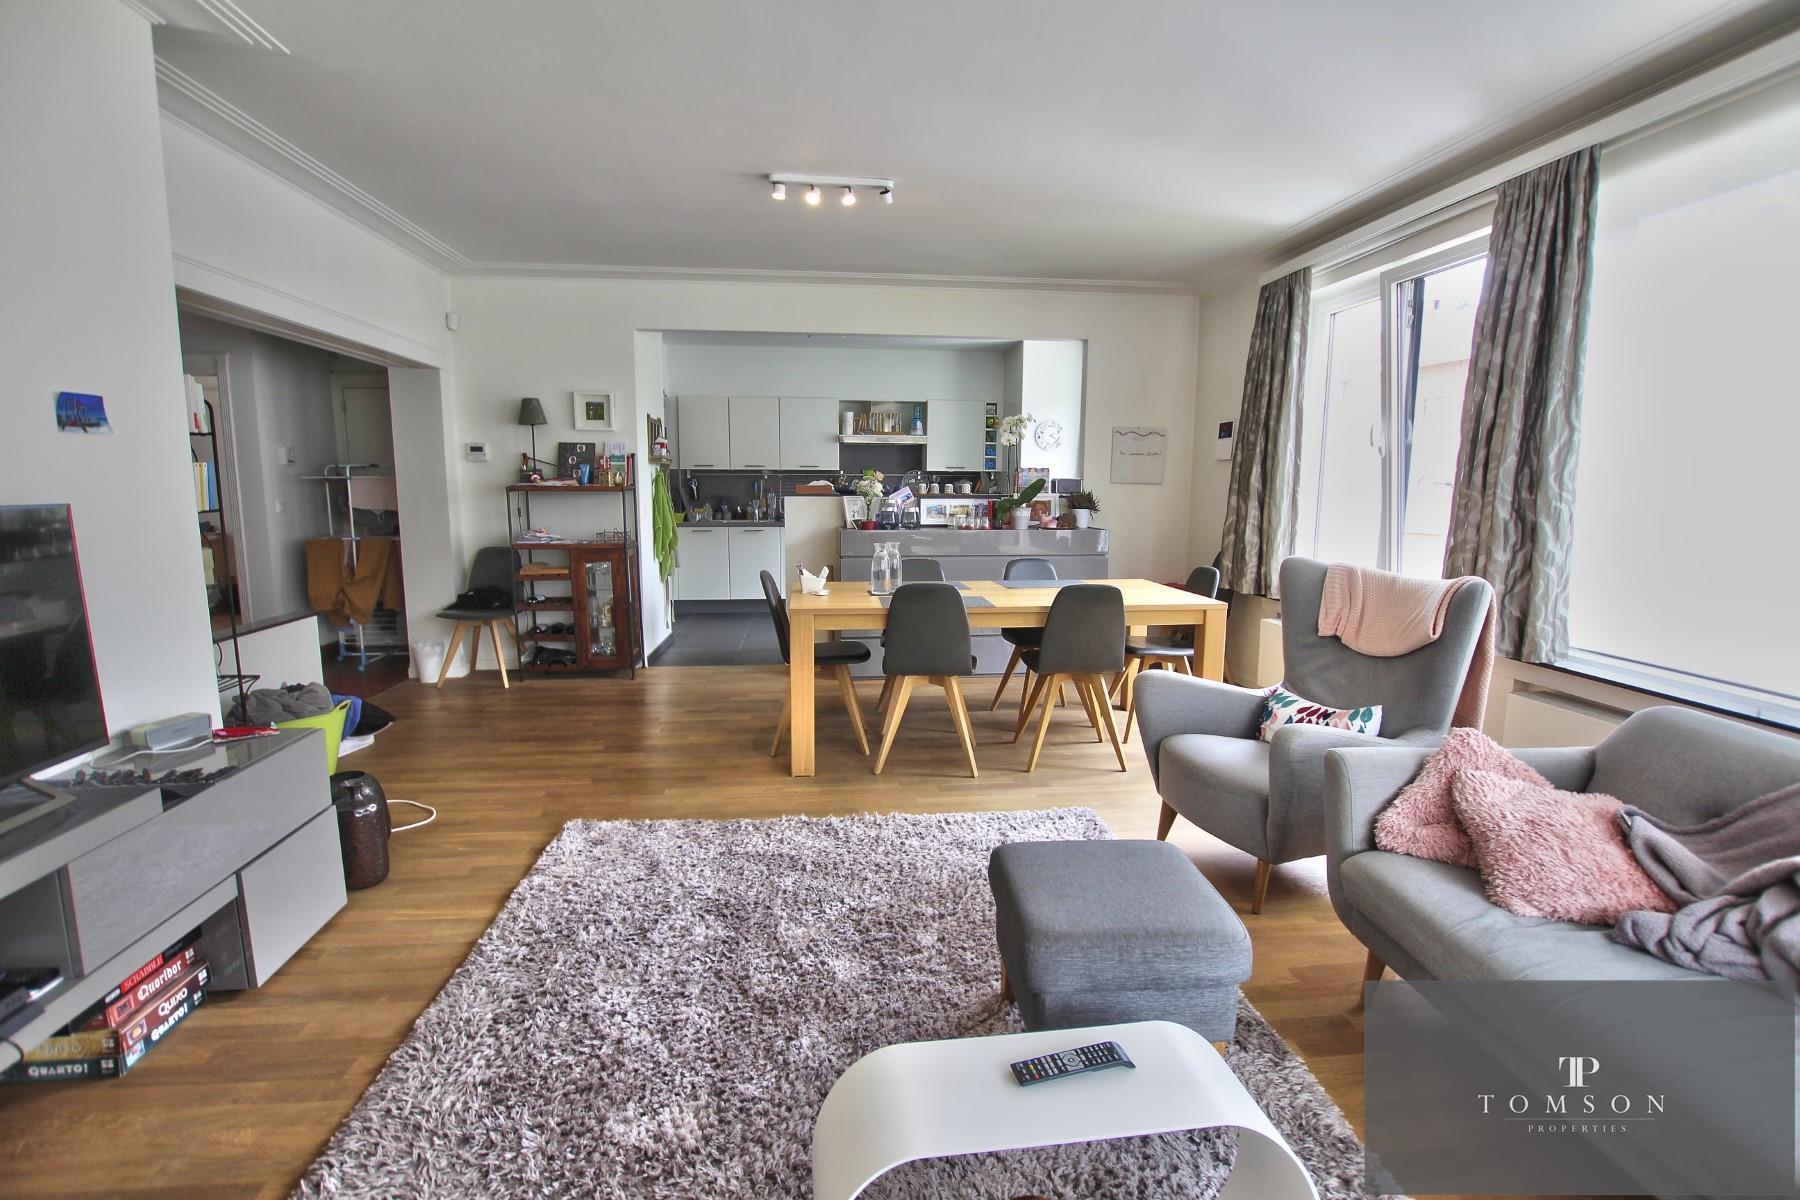 Appartement exceptionnel - Woluwe-Saint-Pierre - #4324789-2